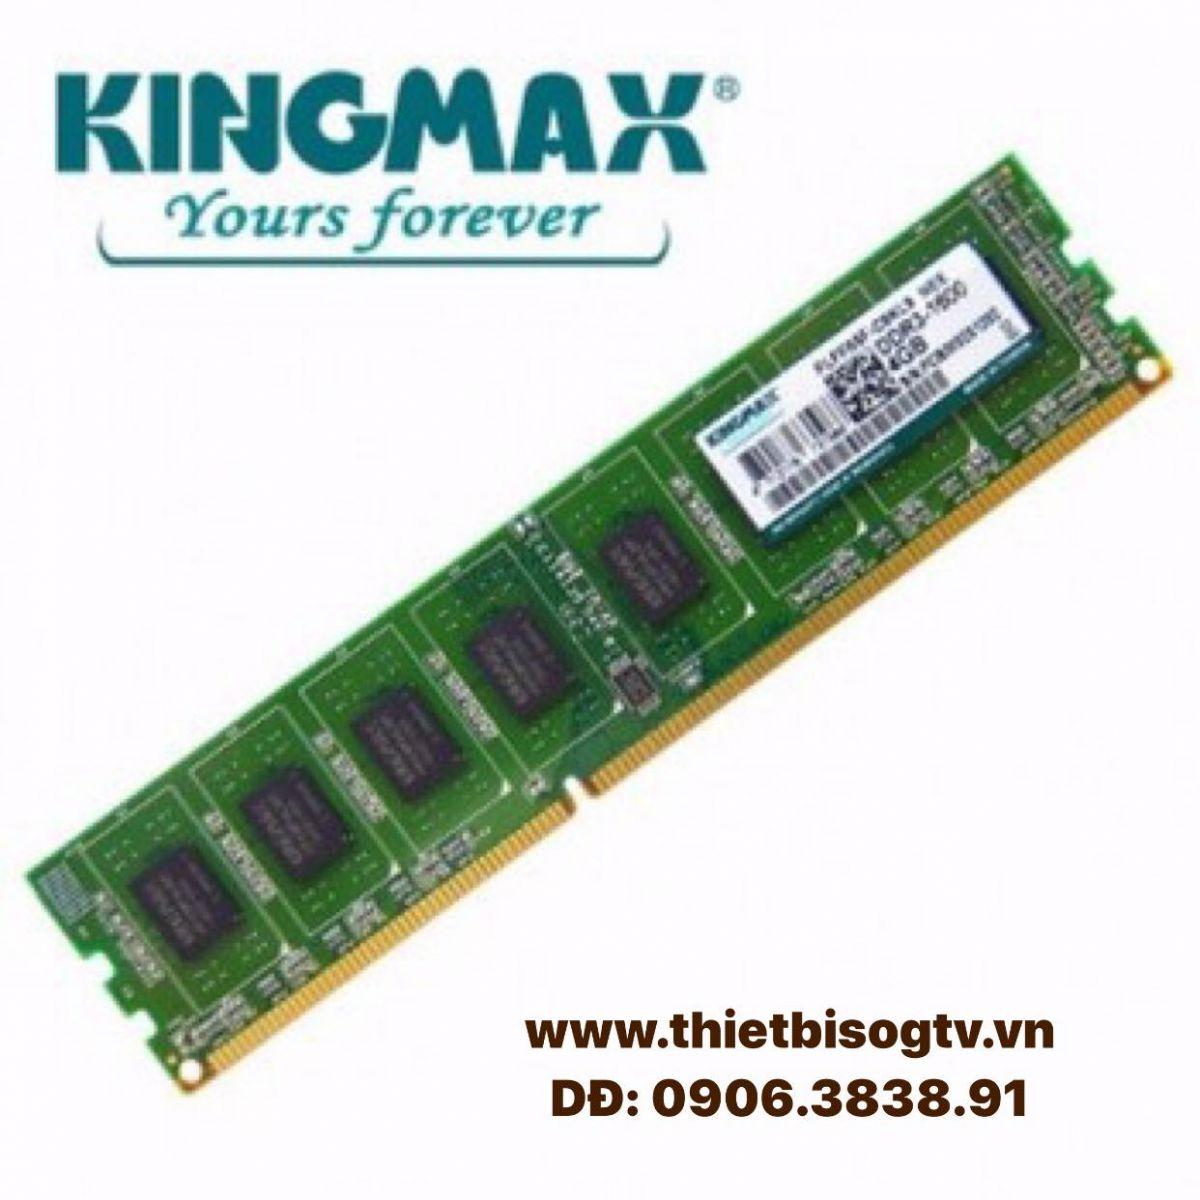 Bộ nhớ DDR3 Kingmax 4GB bus 1600